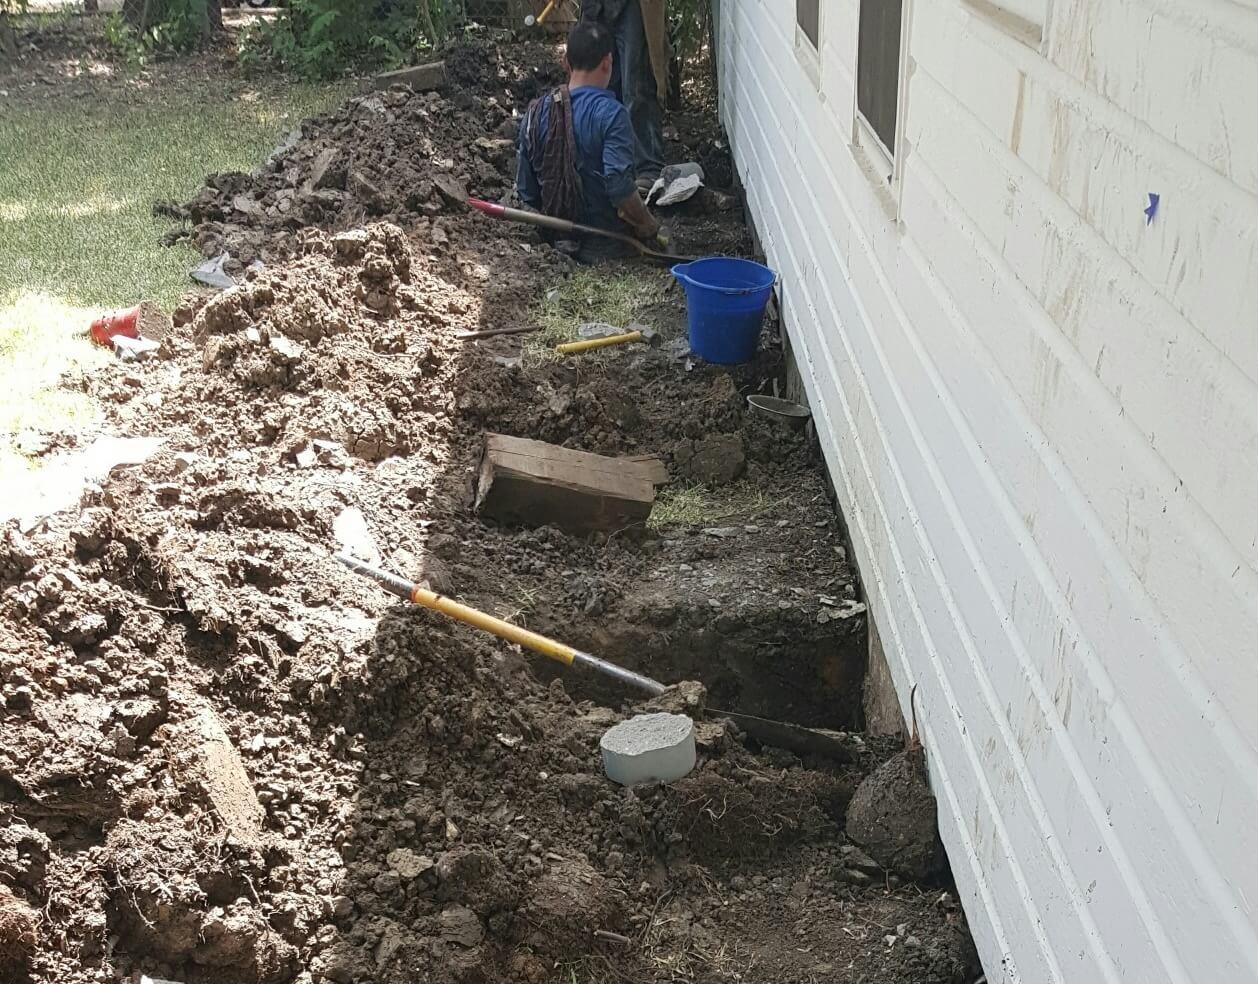 Foundations often sink or settle